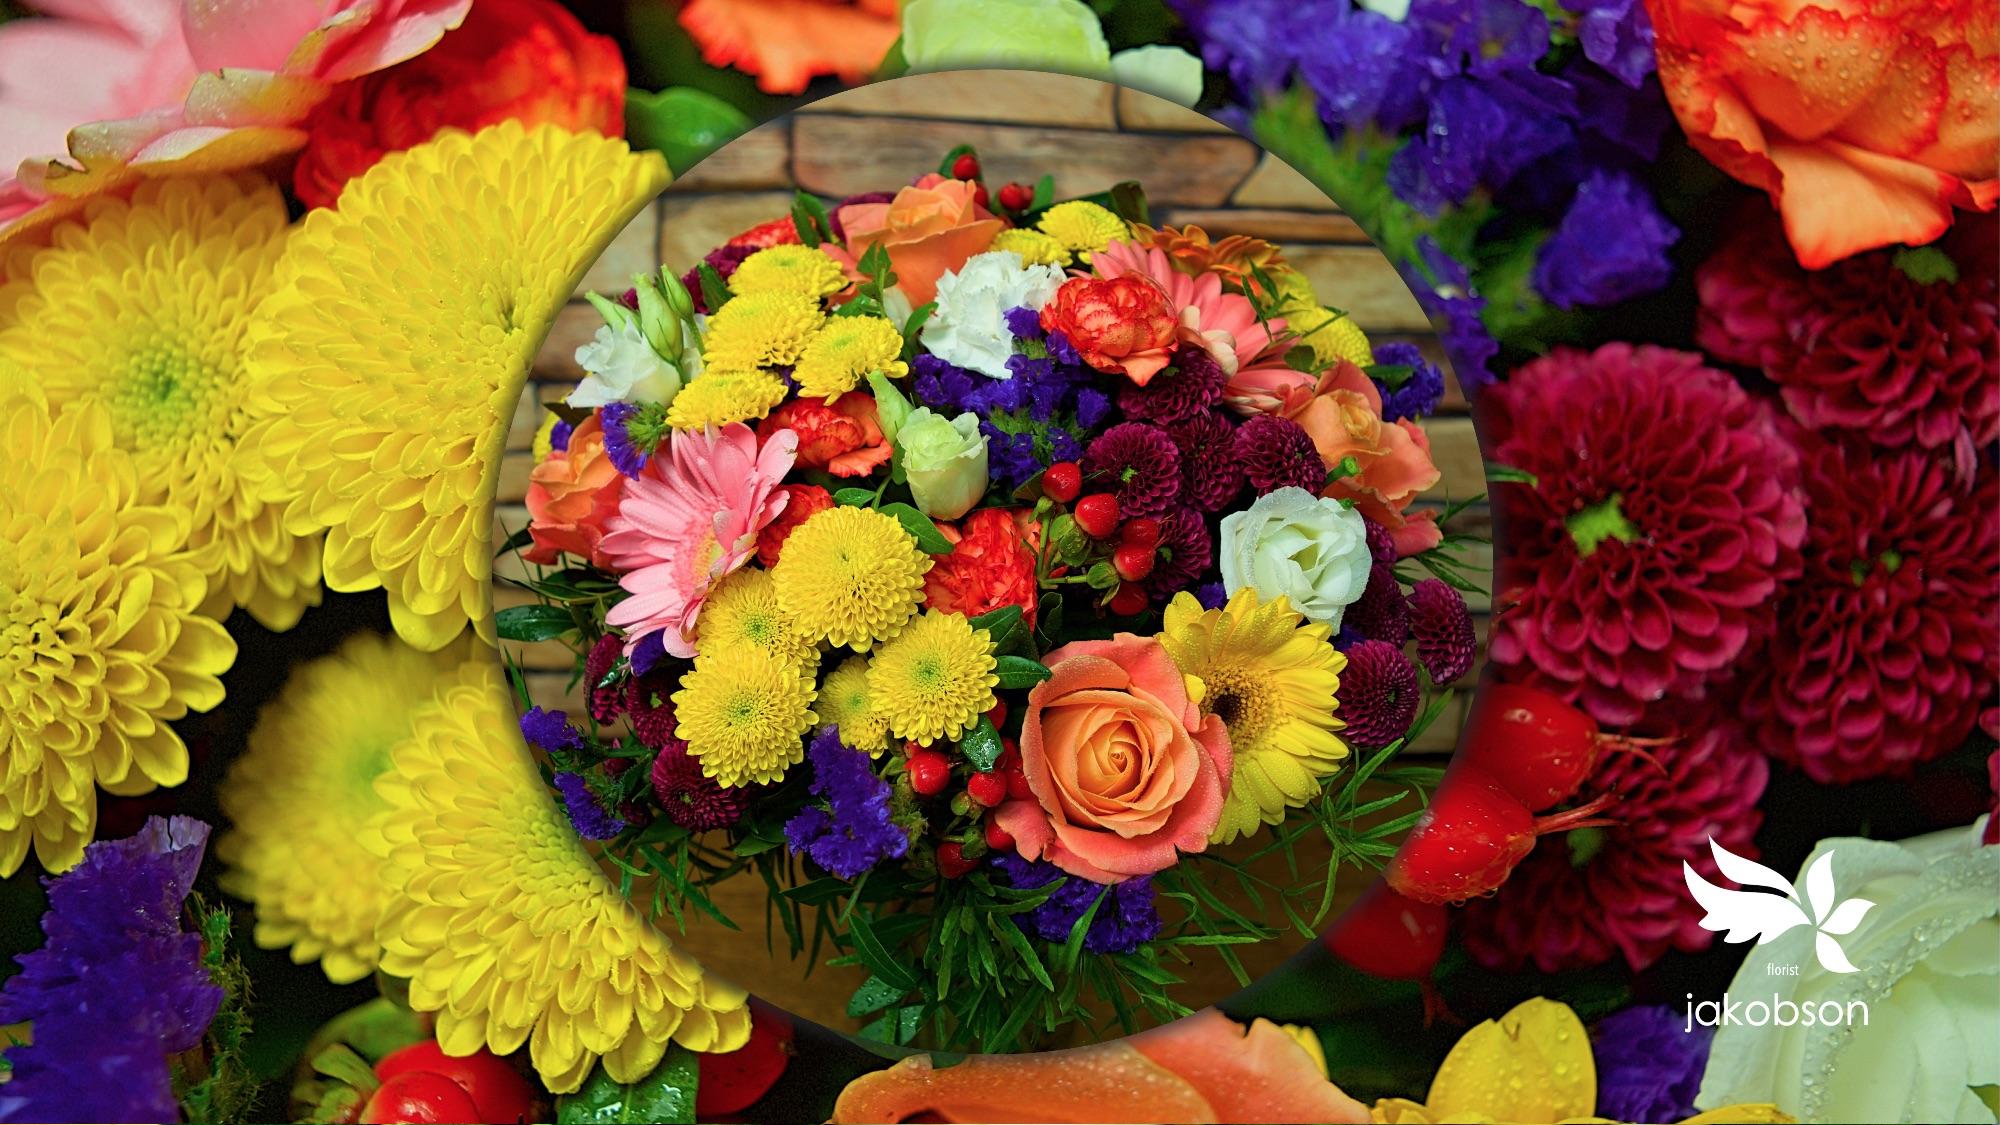 доставка цветов Хаапсалу - Похоронные венки в Хаапсалу